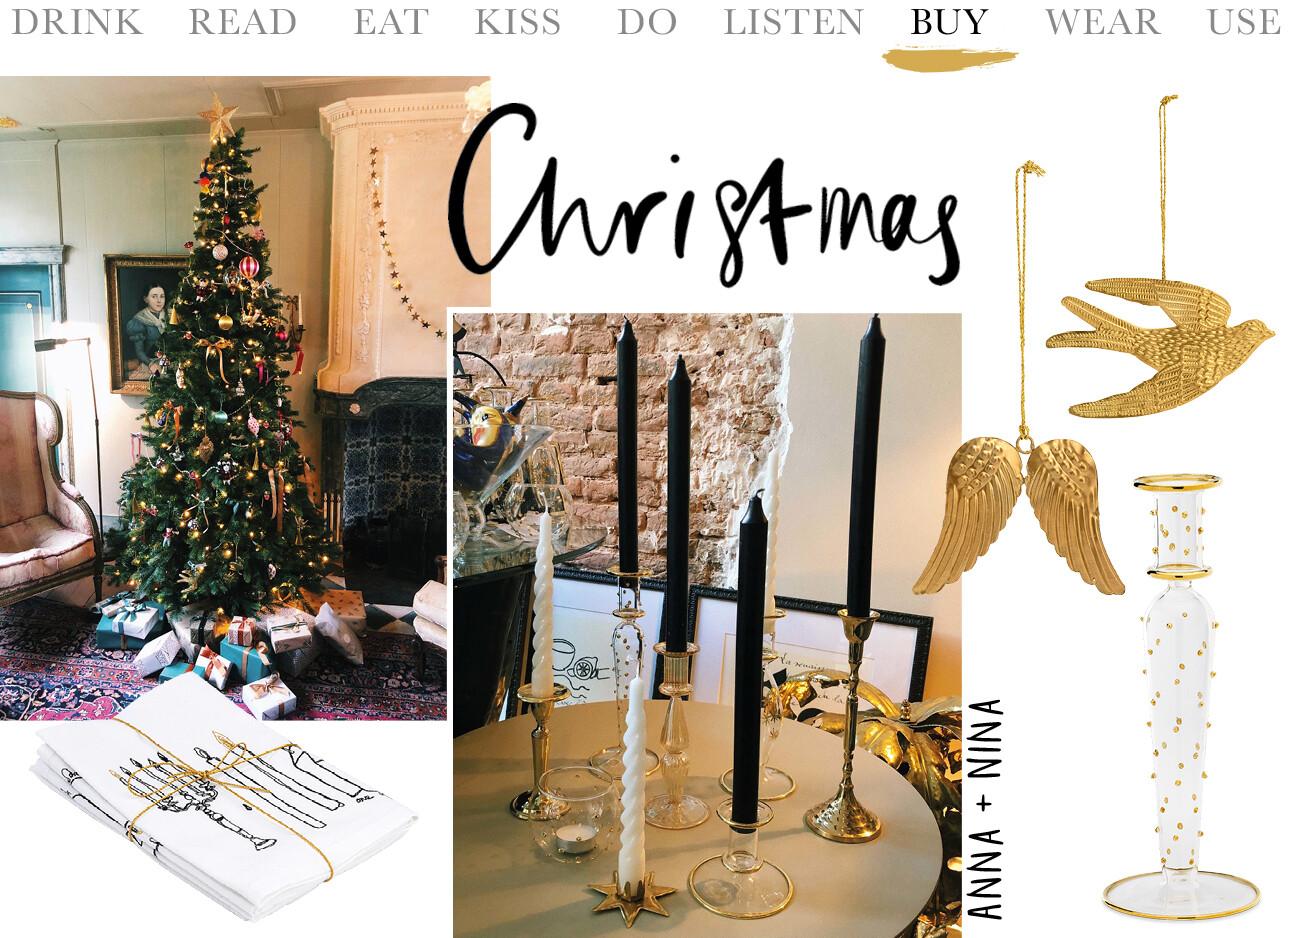 Kerst ornamenten van Anna+nina